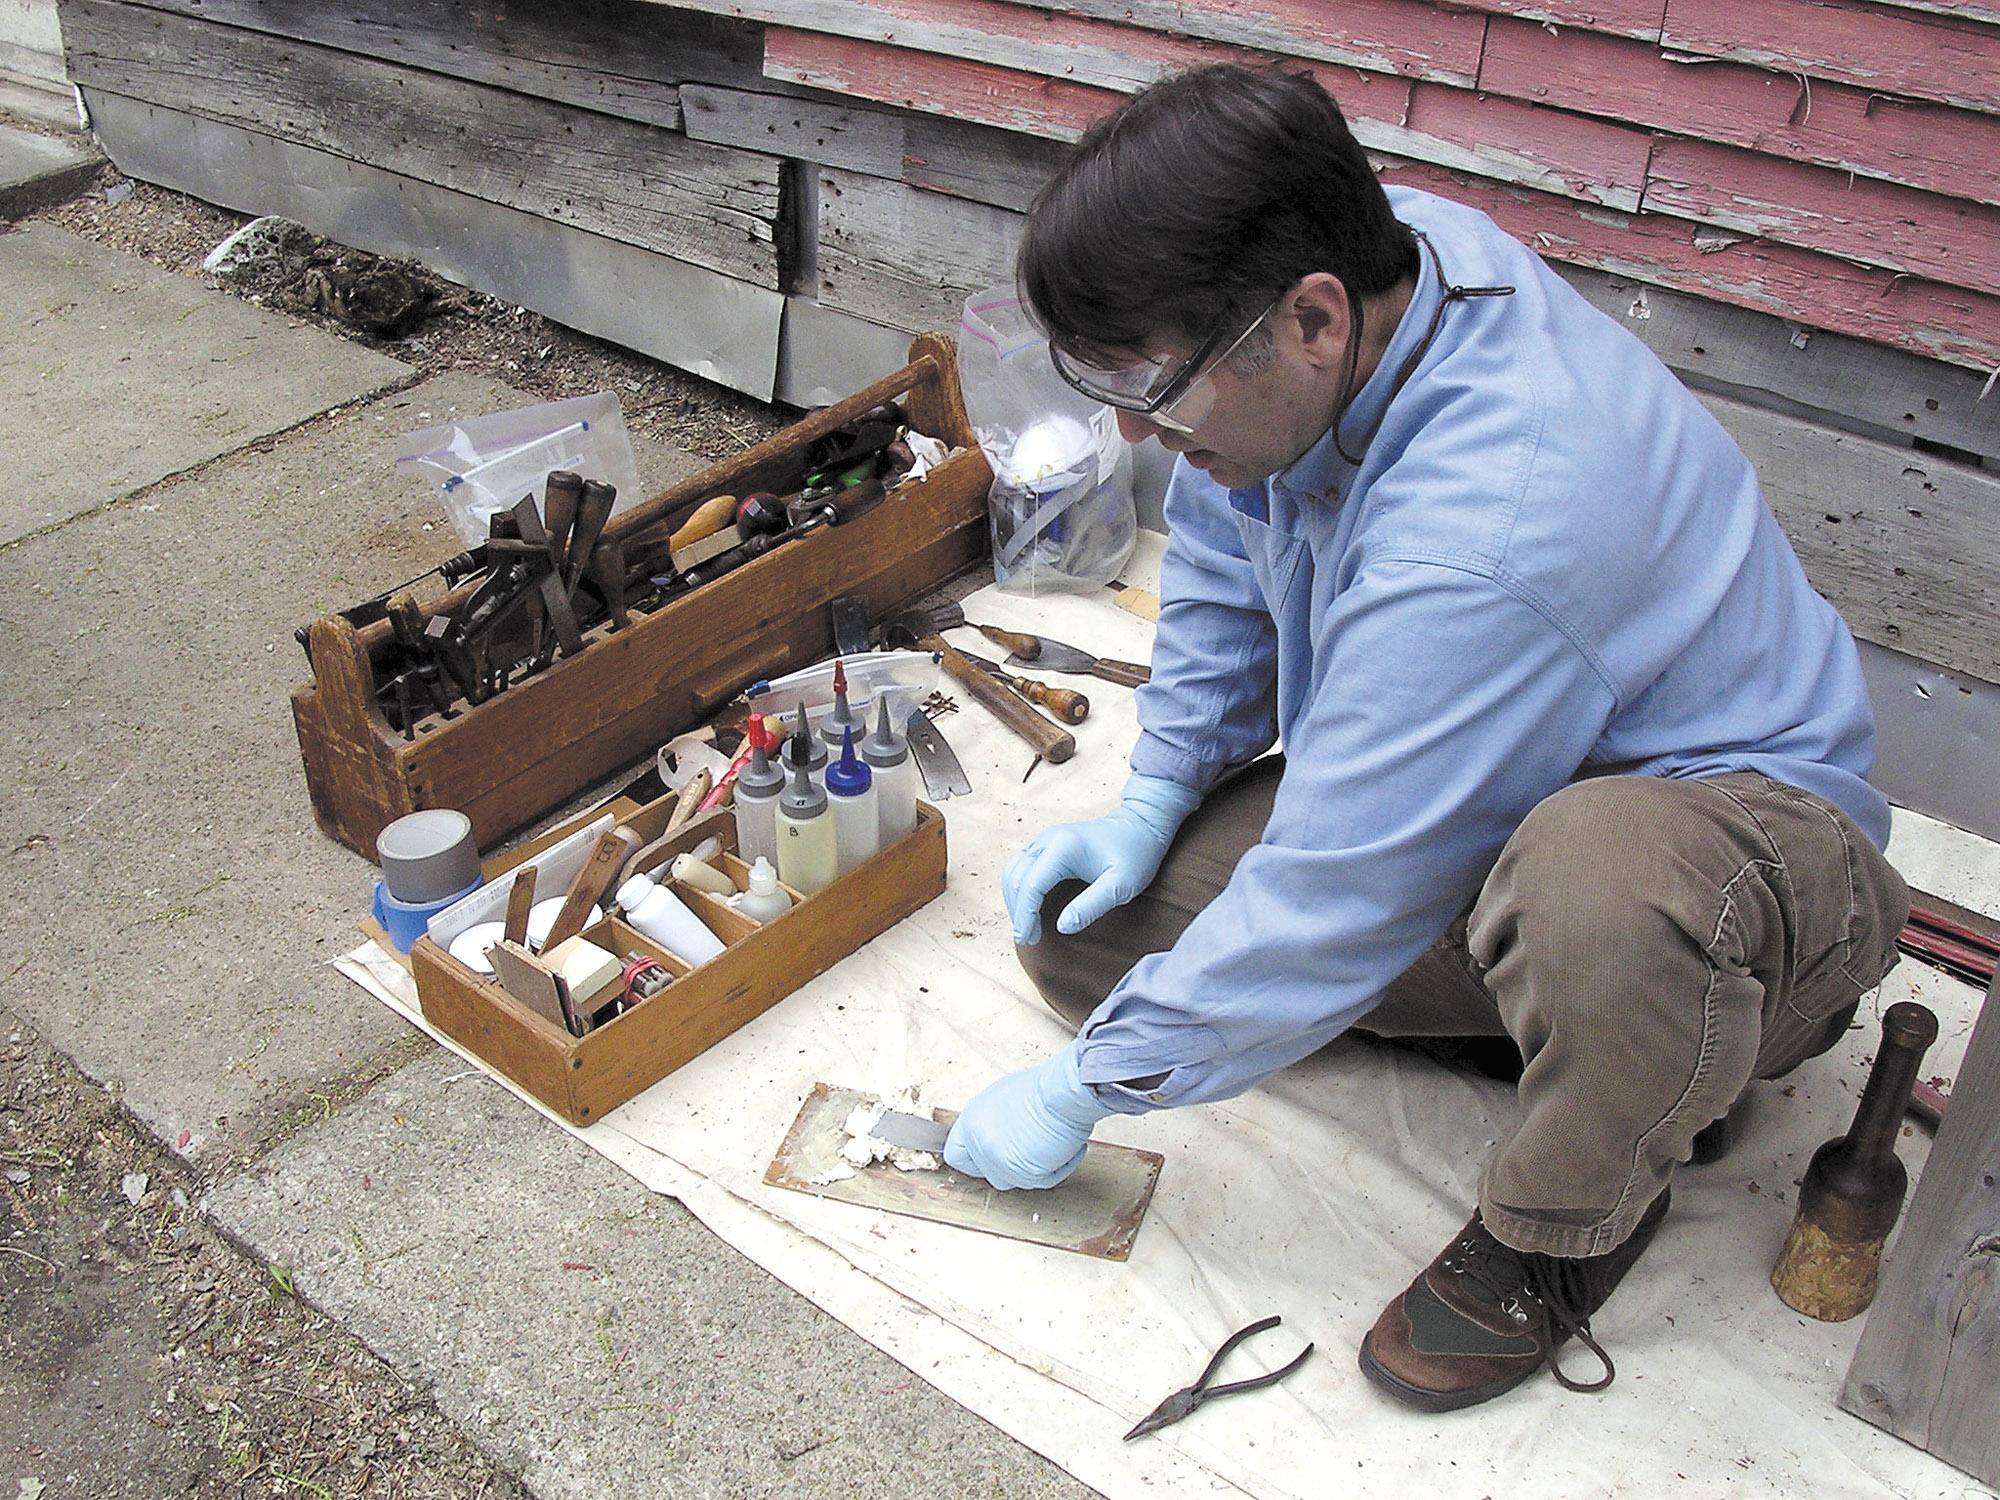 Epoxies for Wood Repair